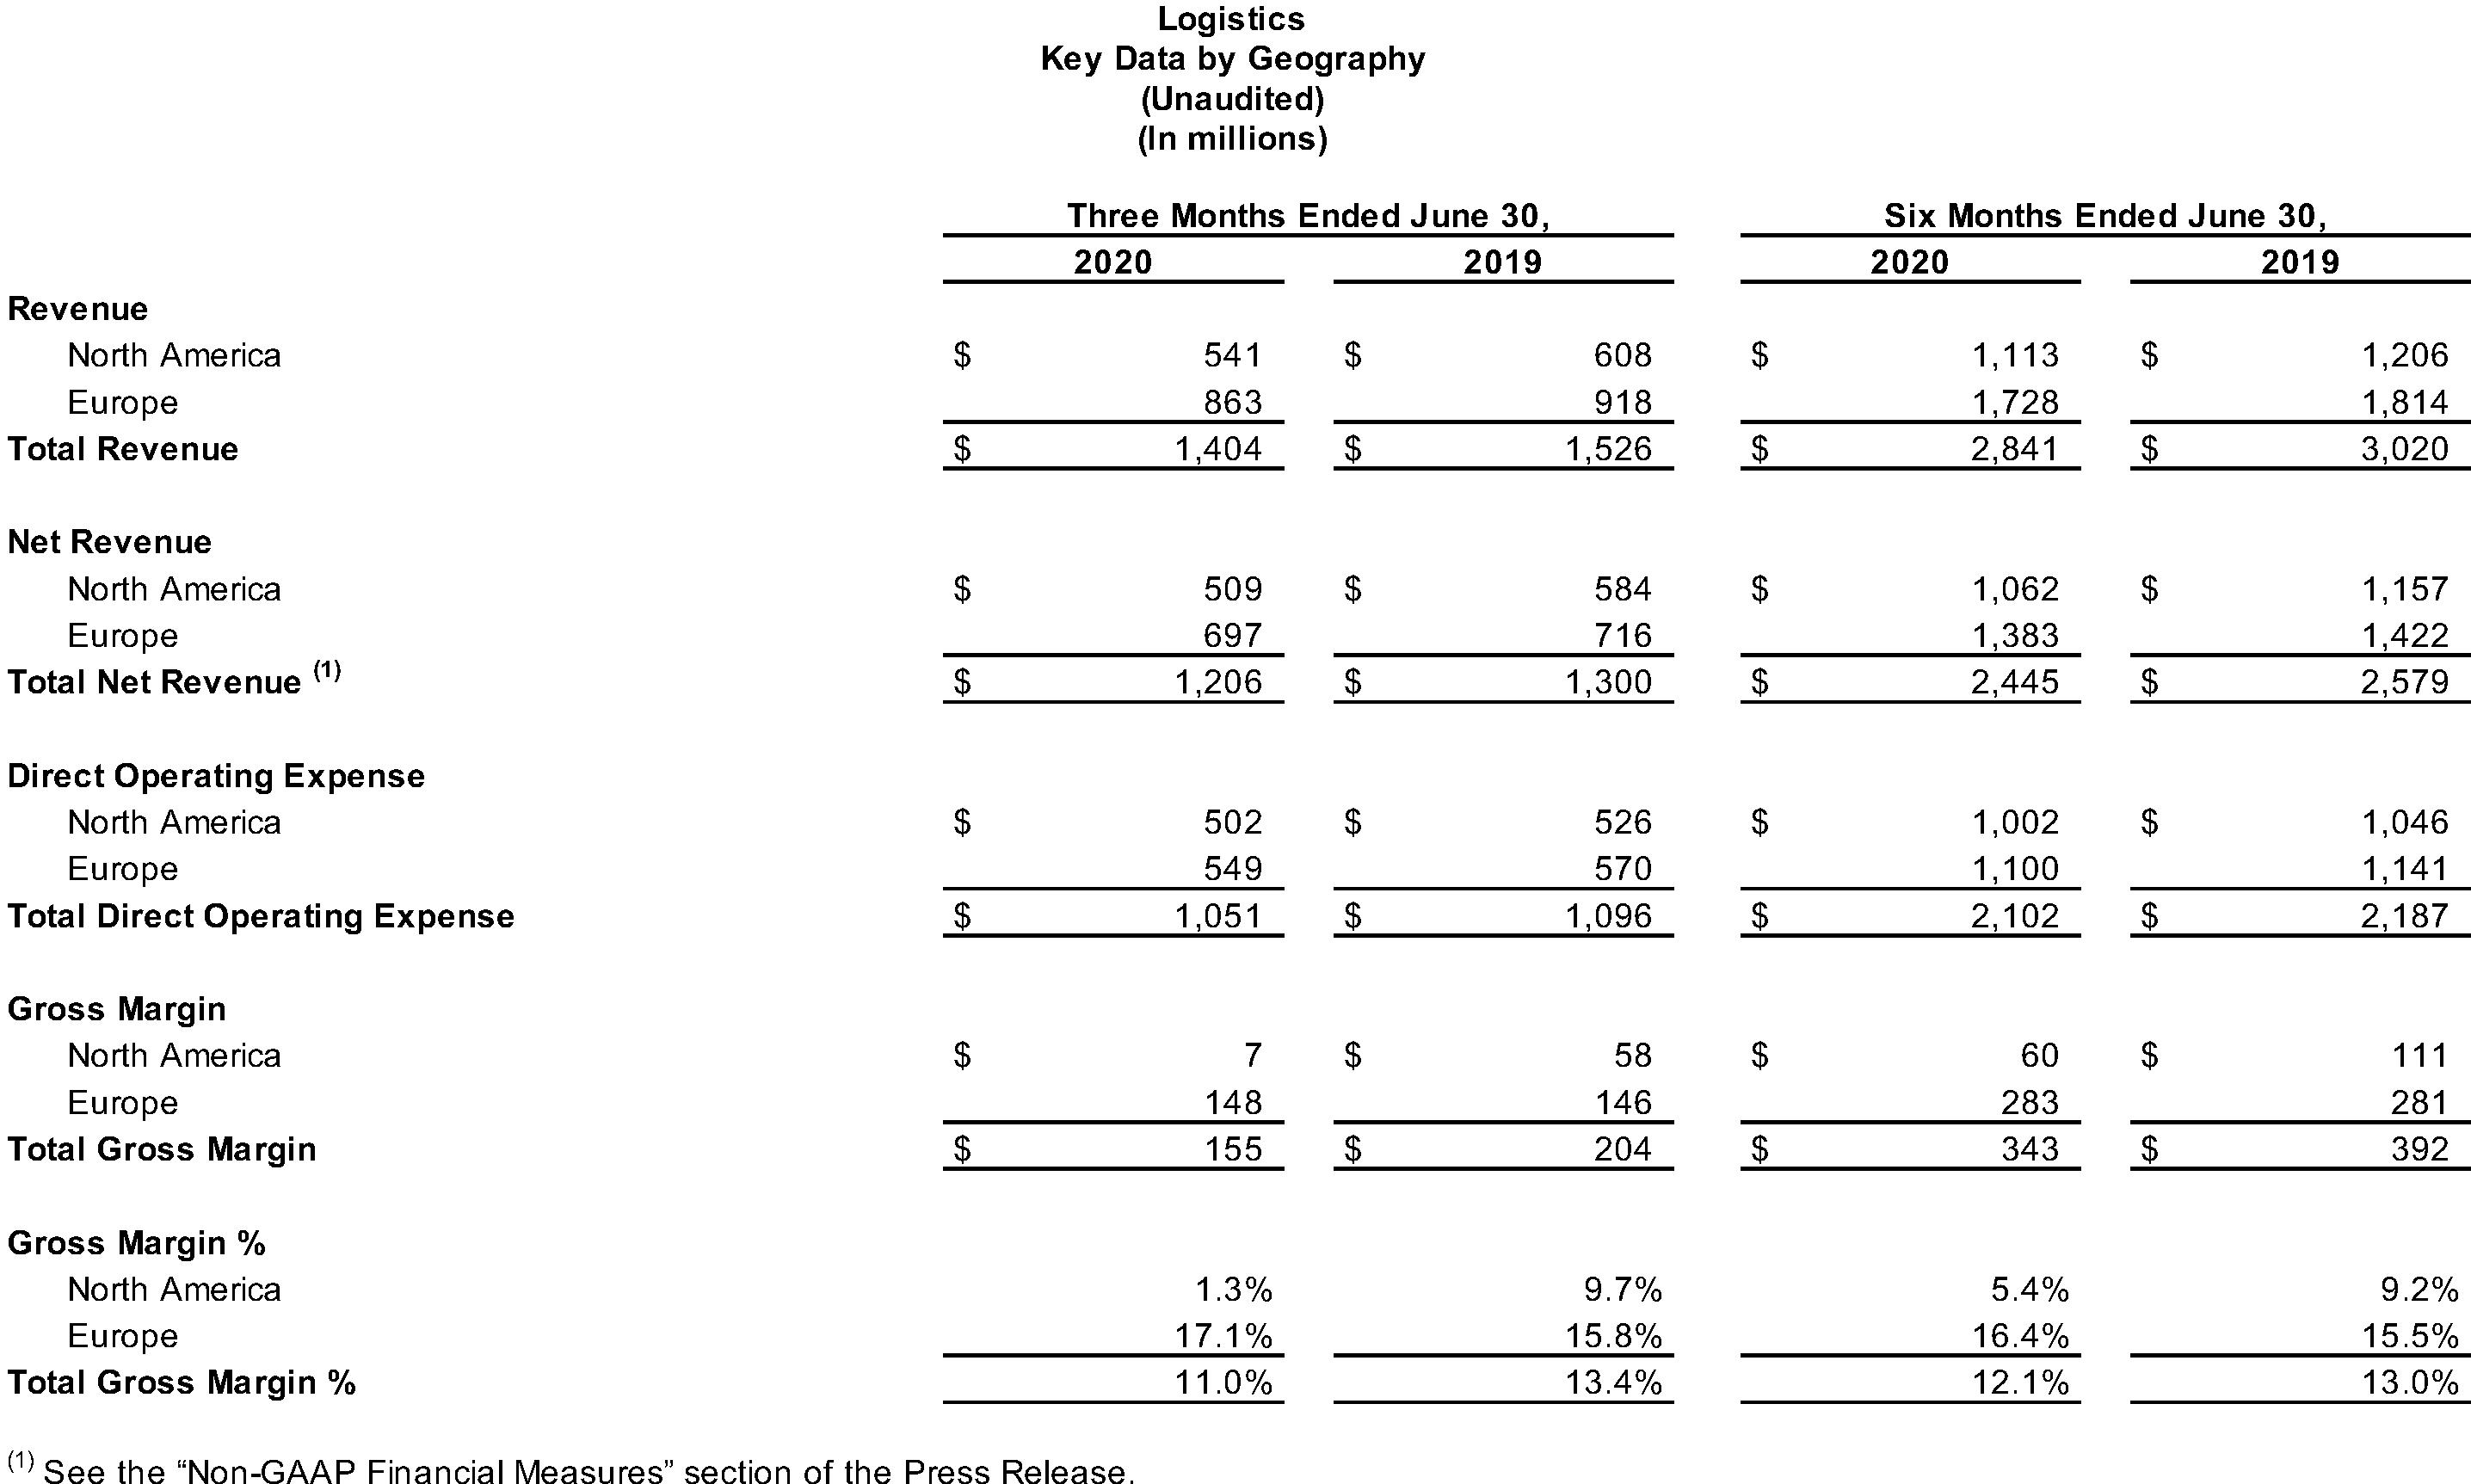 Logistics Key Data by Geography